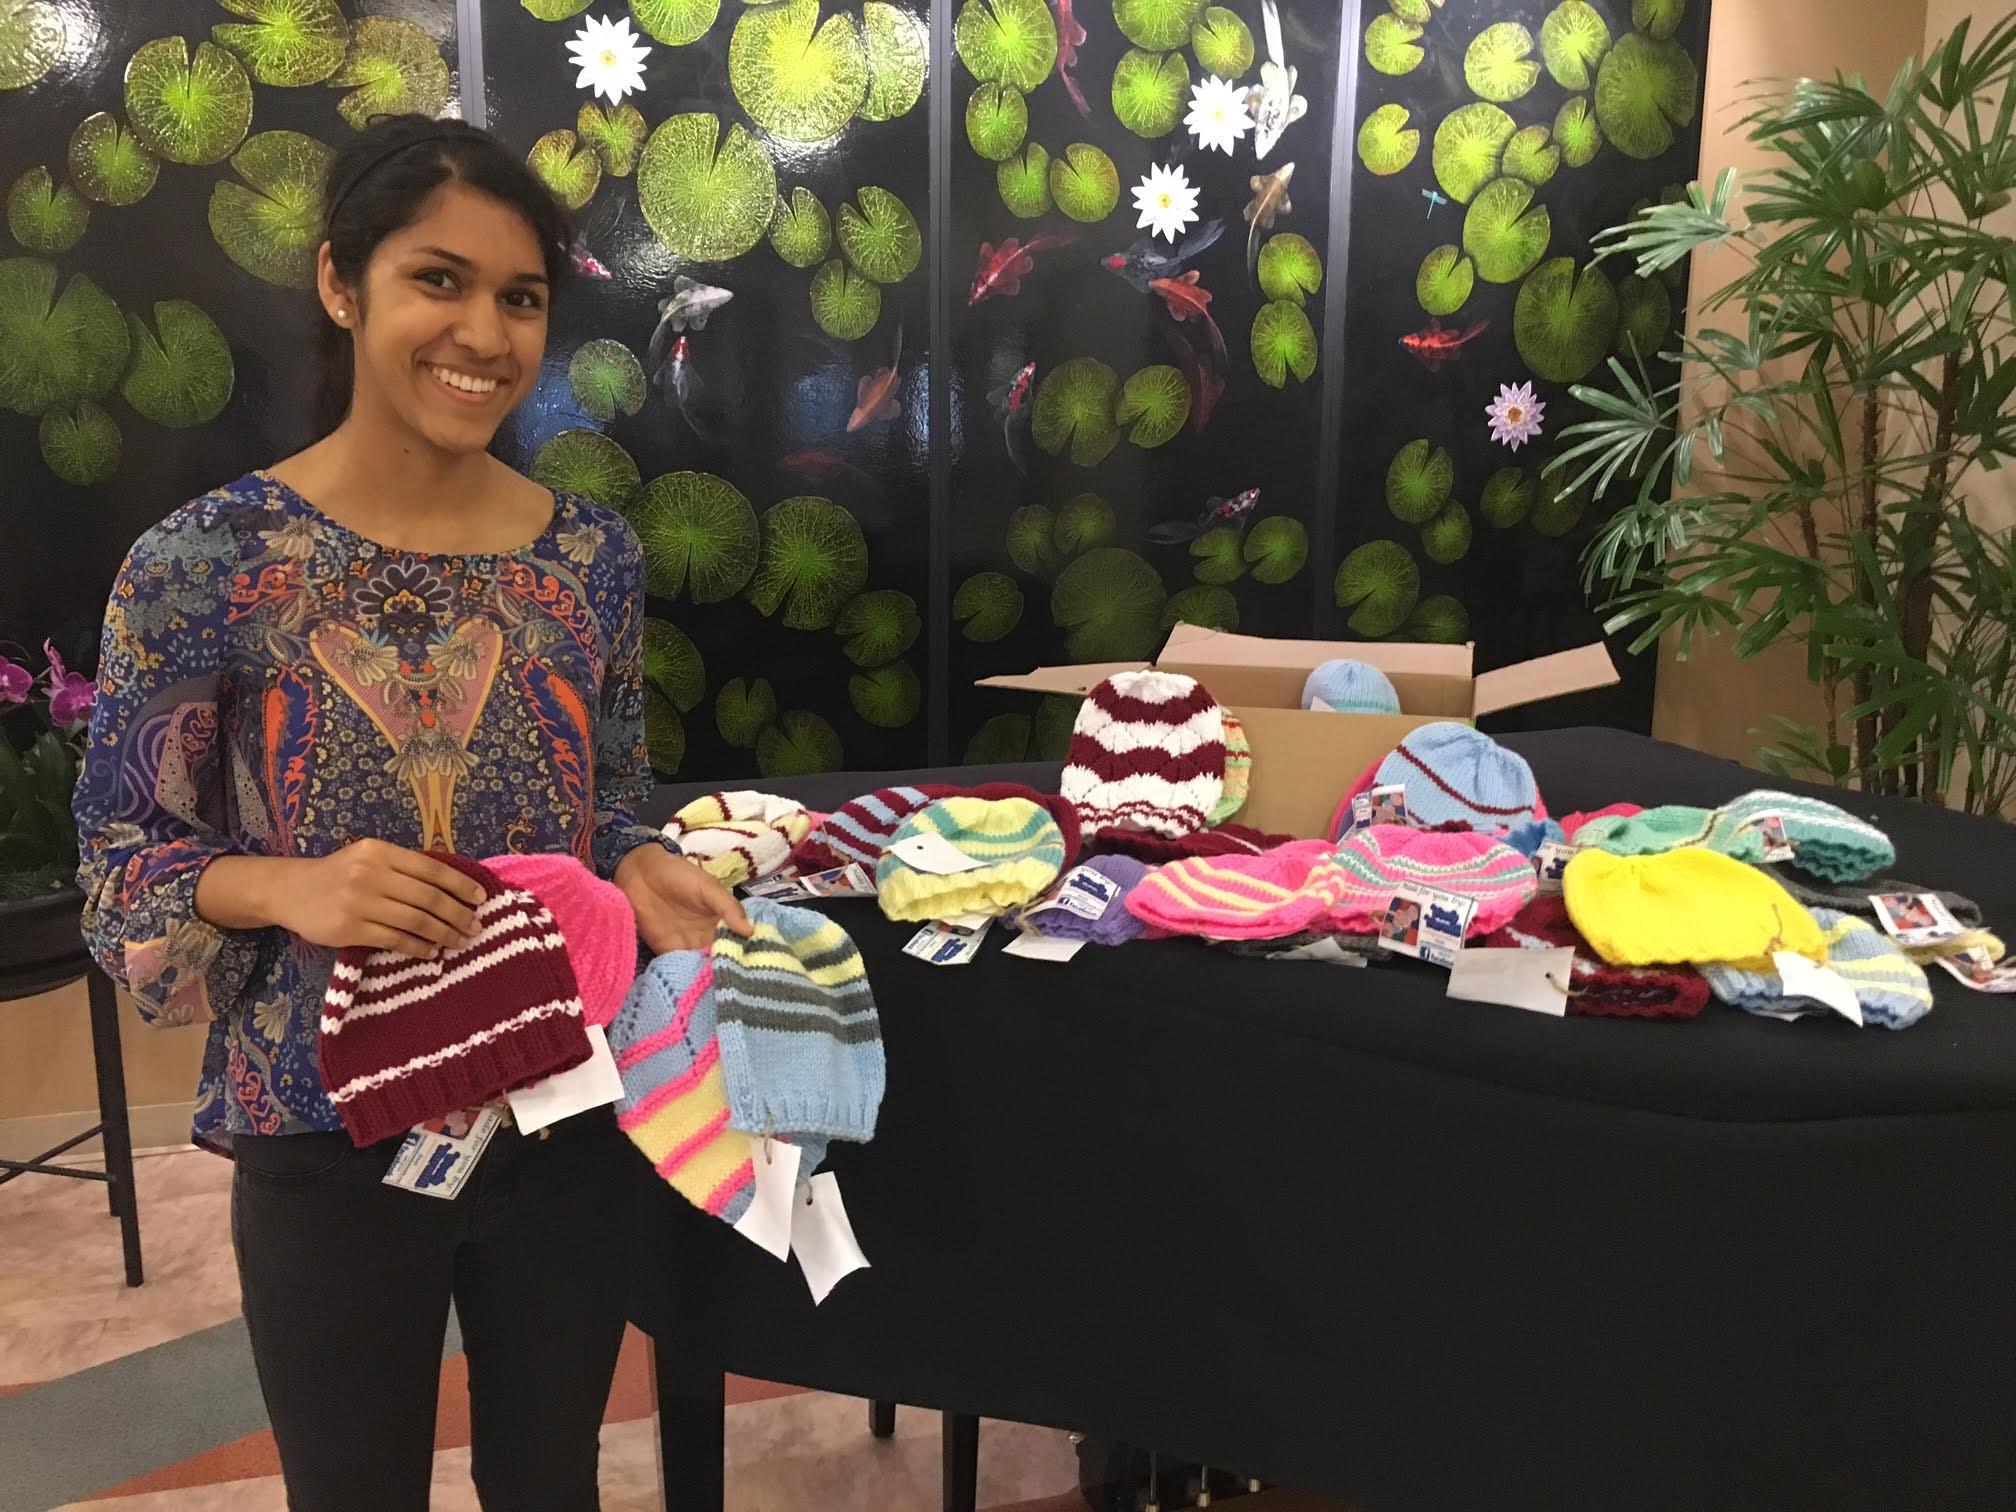 Nikita Salunke making a donation at Good Samaritan Hospital